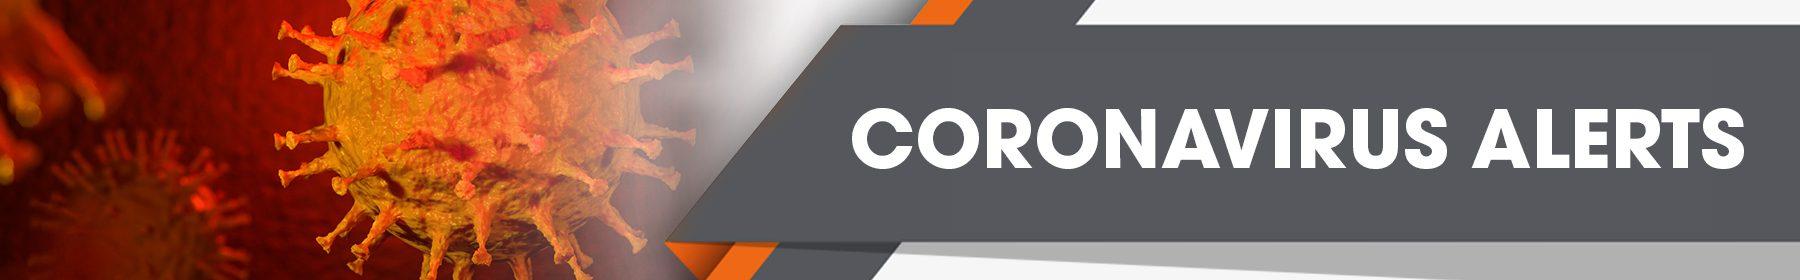 HBL HOPE & HELP – Coronavirus Business Survival Alerts